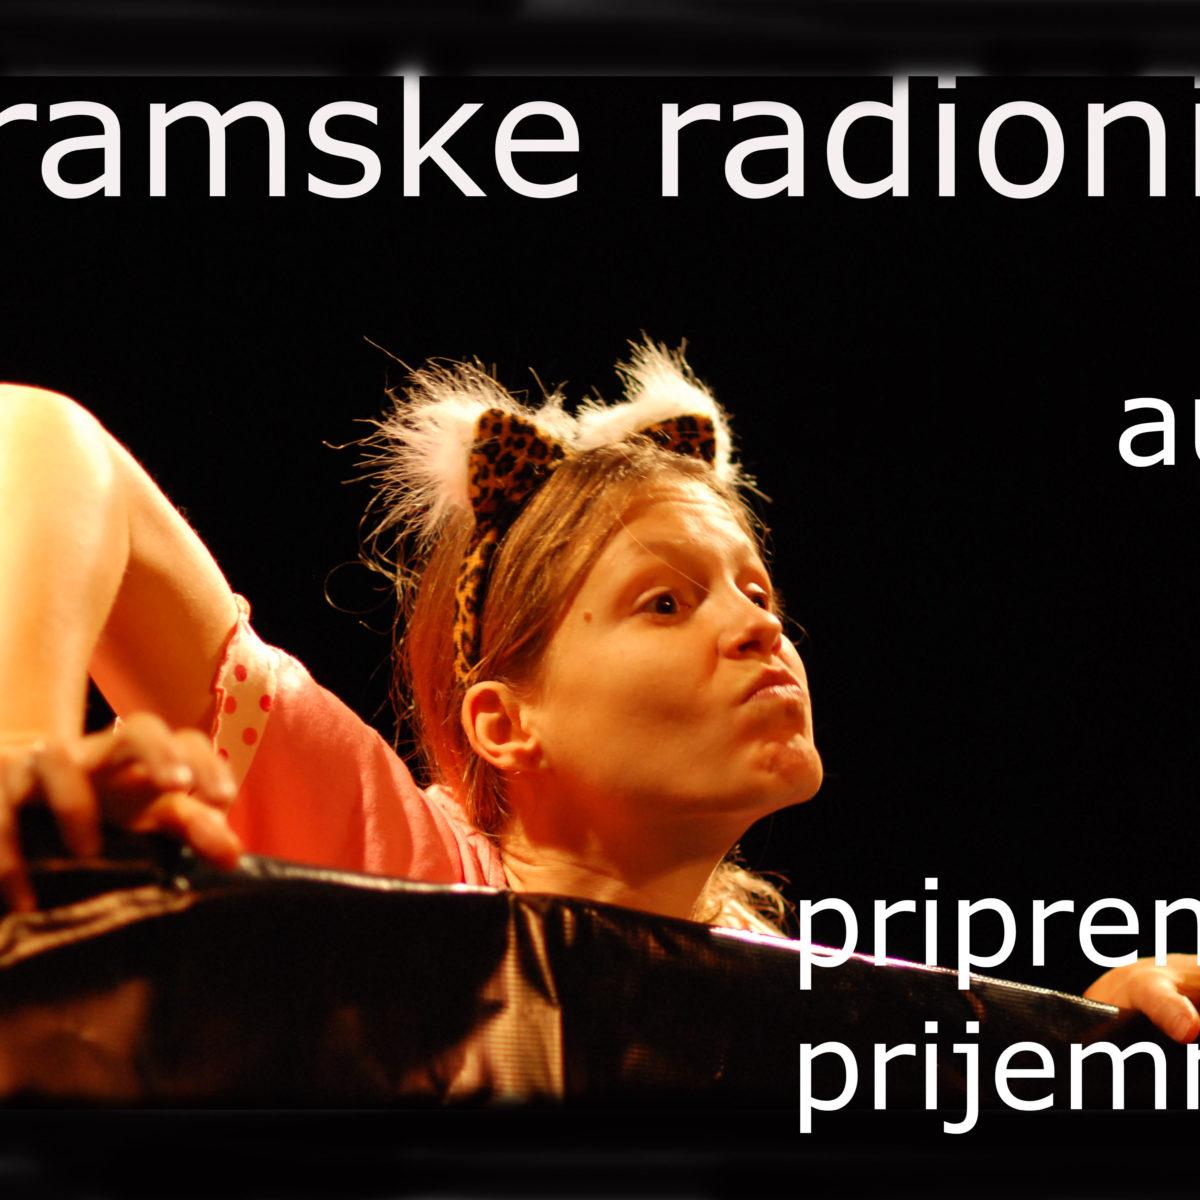 UPISI OD 1. – 30. 10. 2017: Dramske radionice CeKaTea za amatere i profesionalce